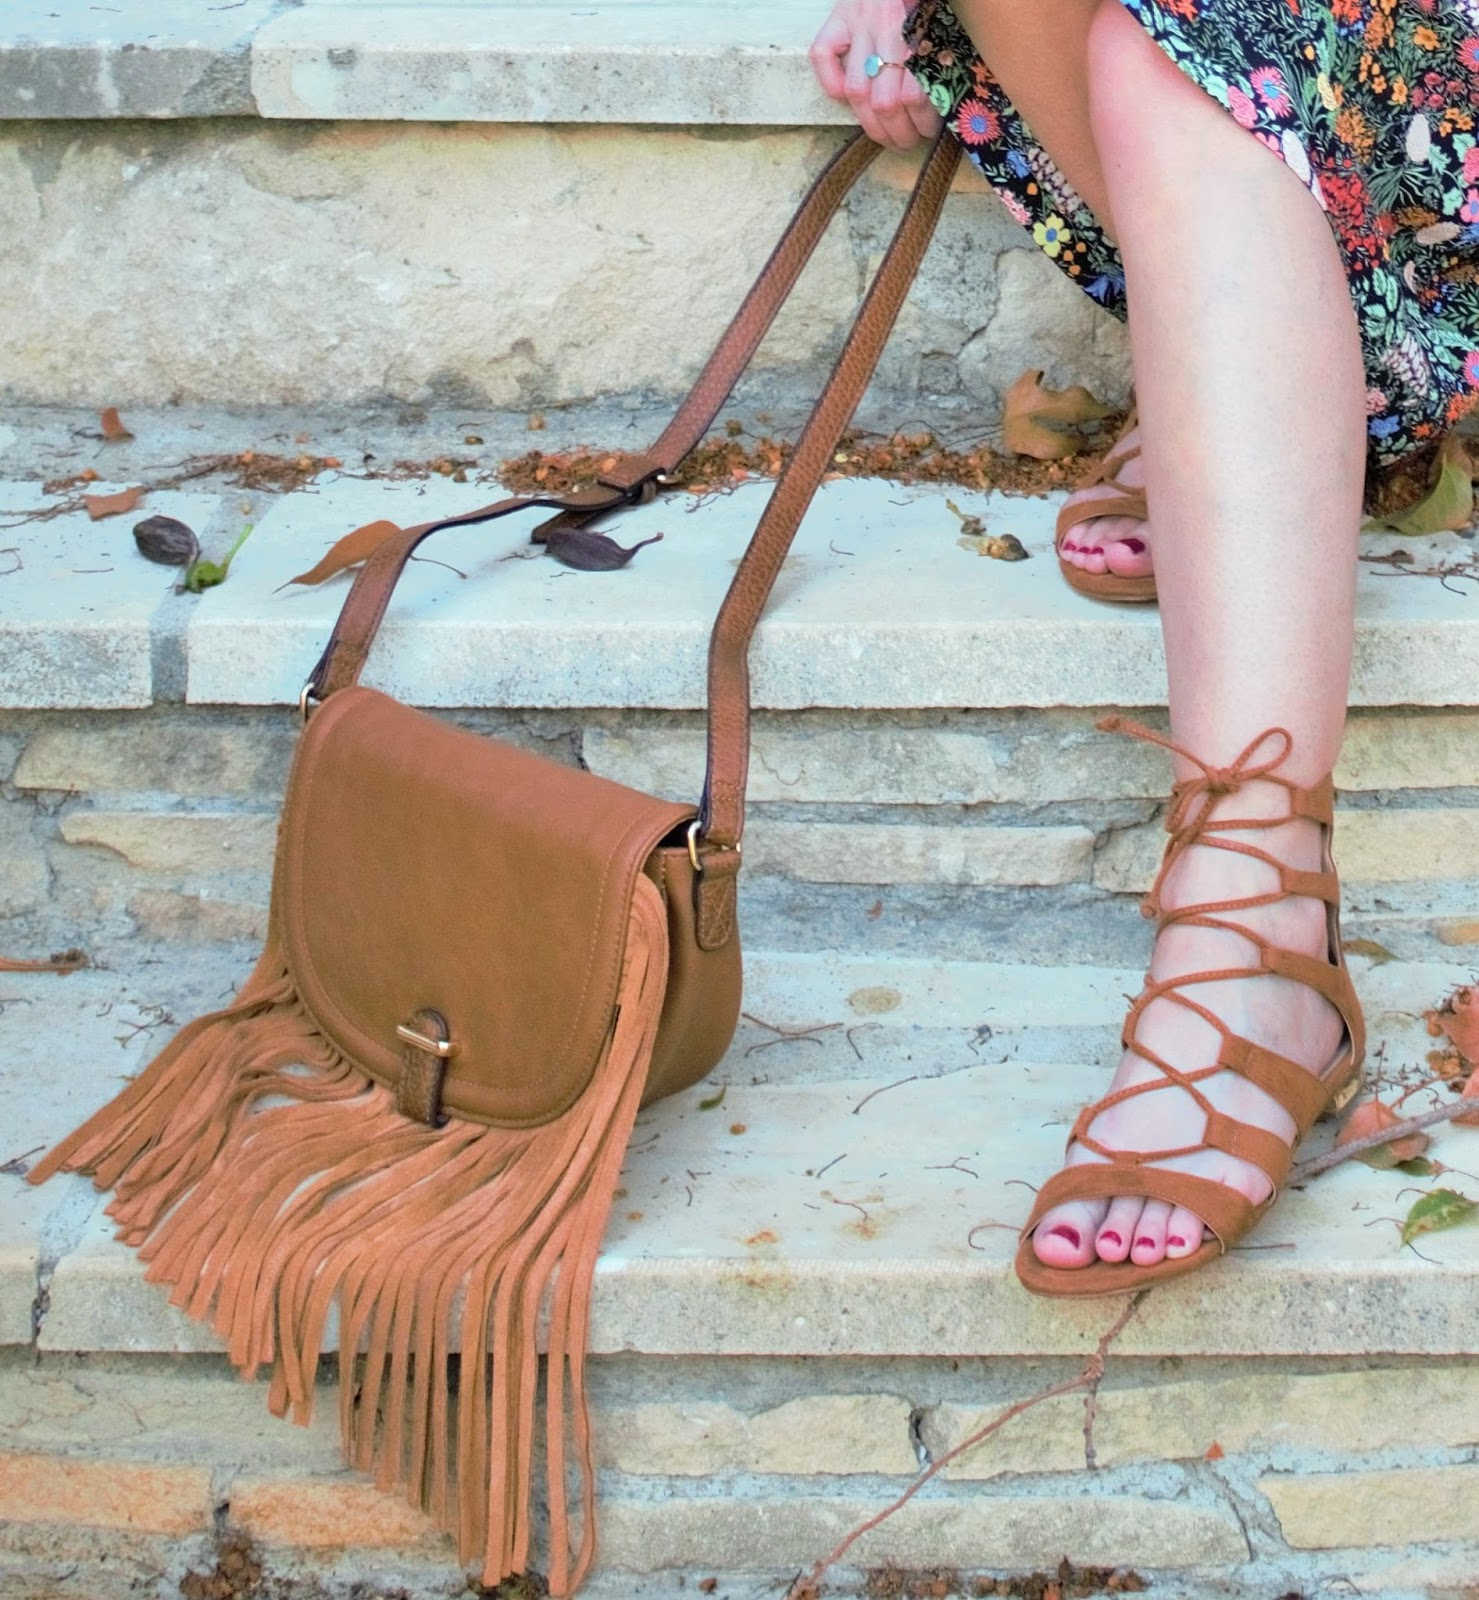 Topshop fringed Boho bag and lace-up sandals